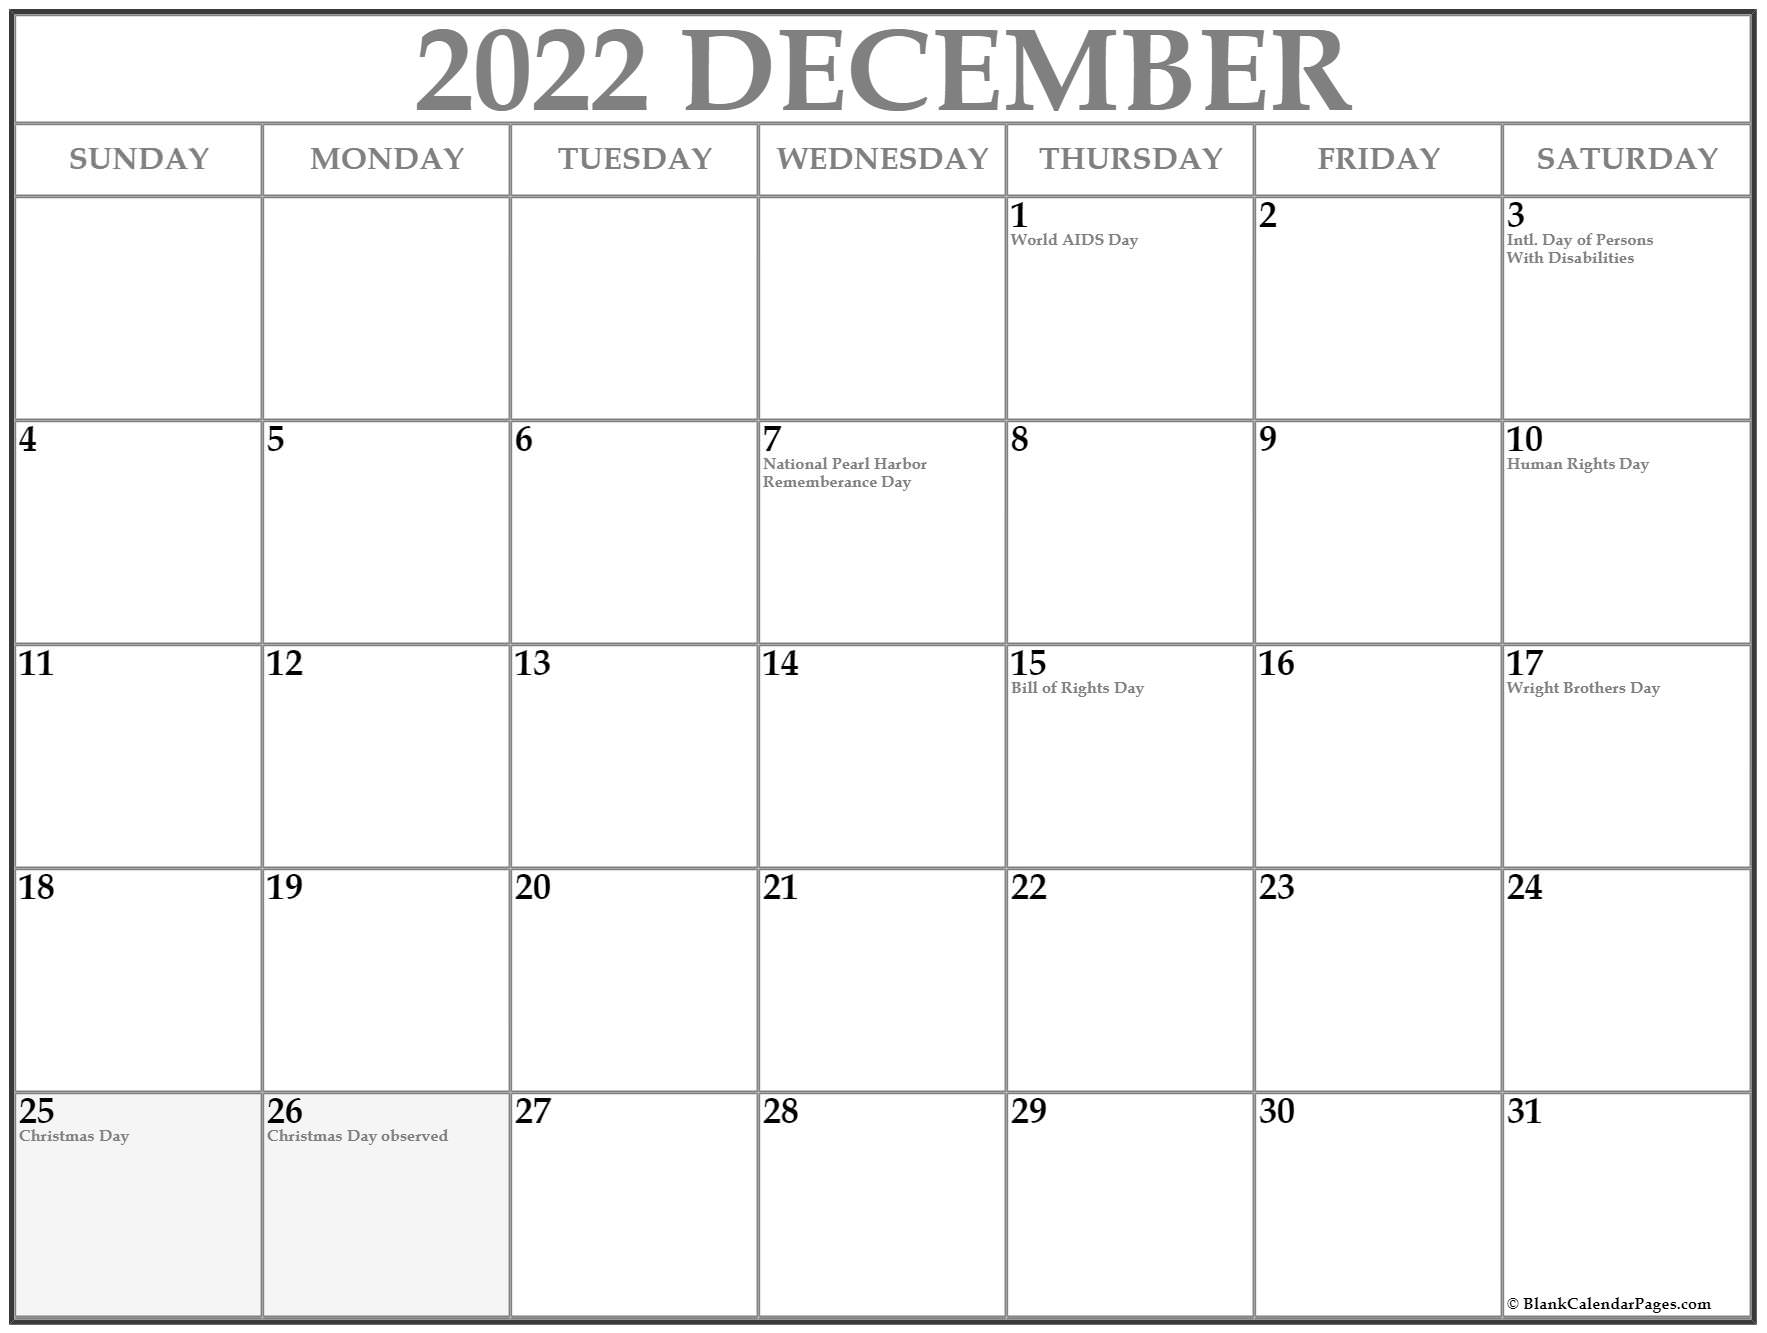 December USA holidays calendar